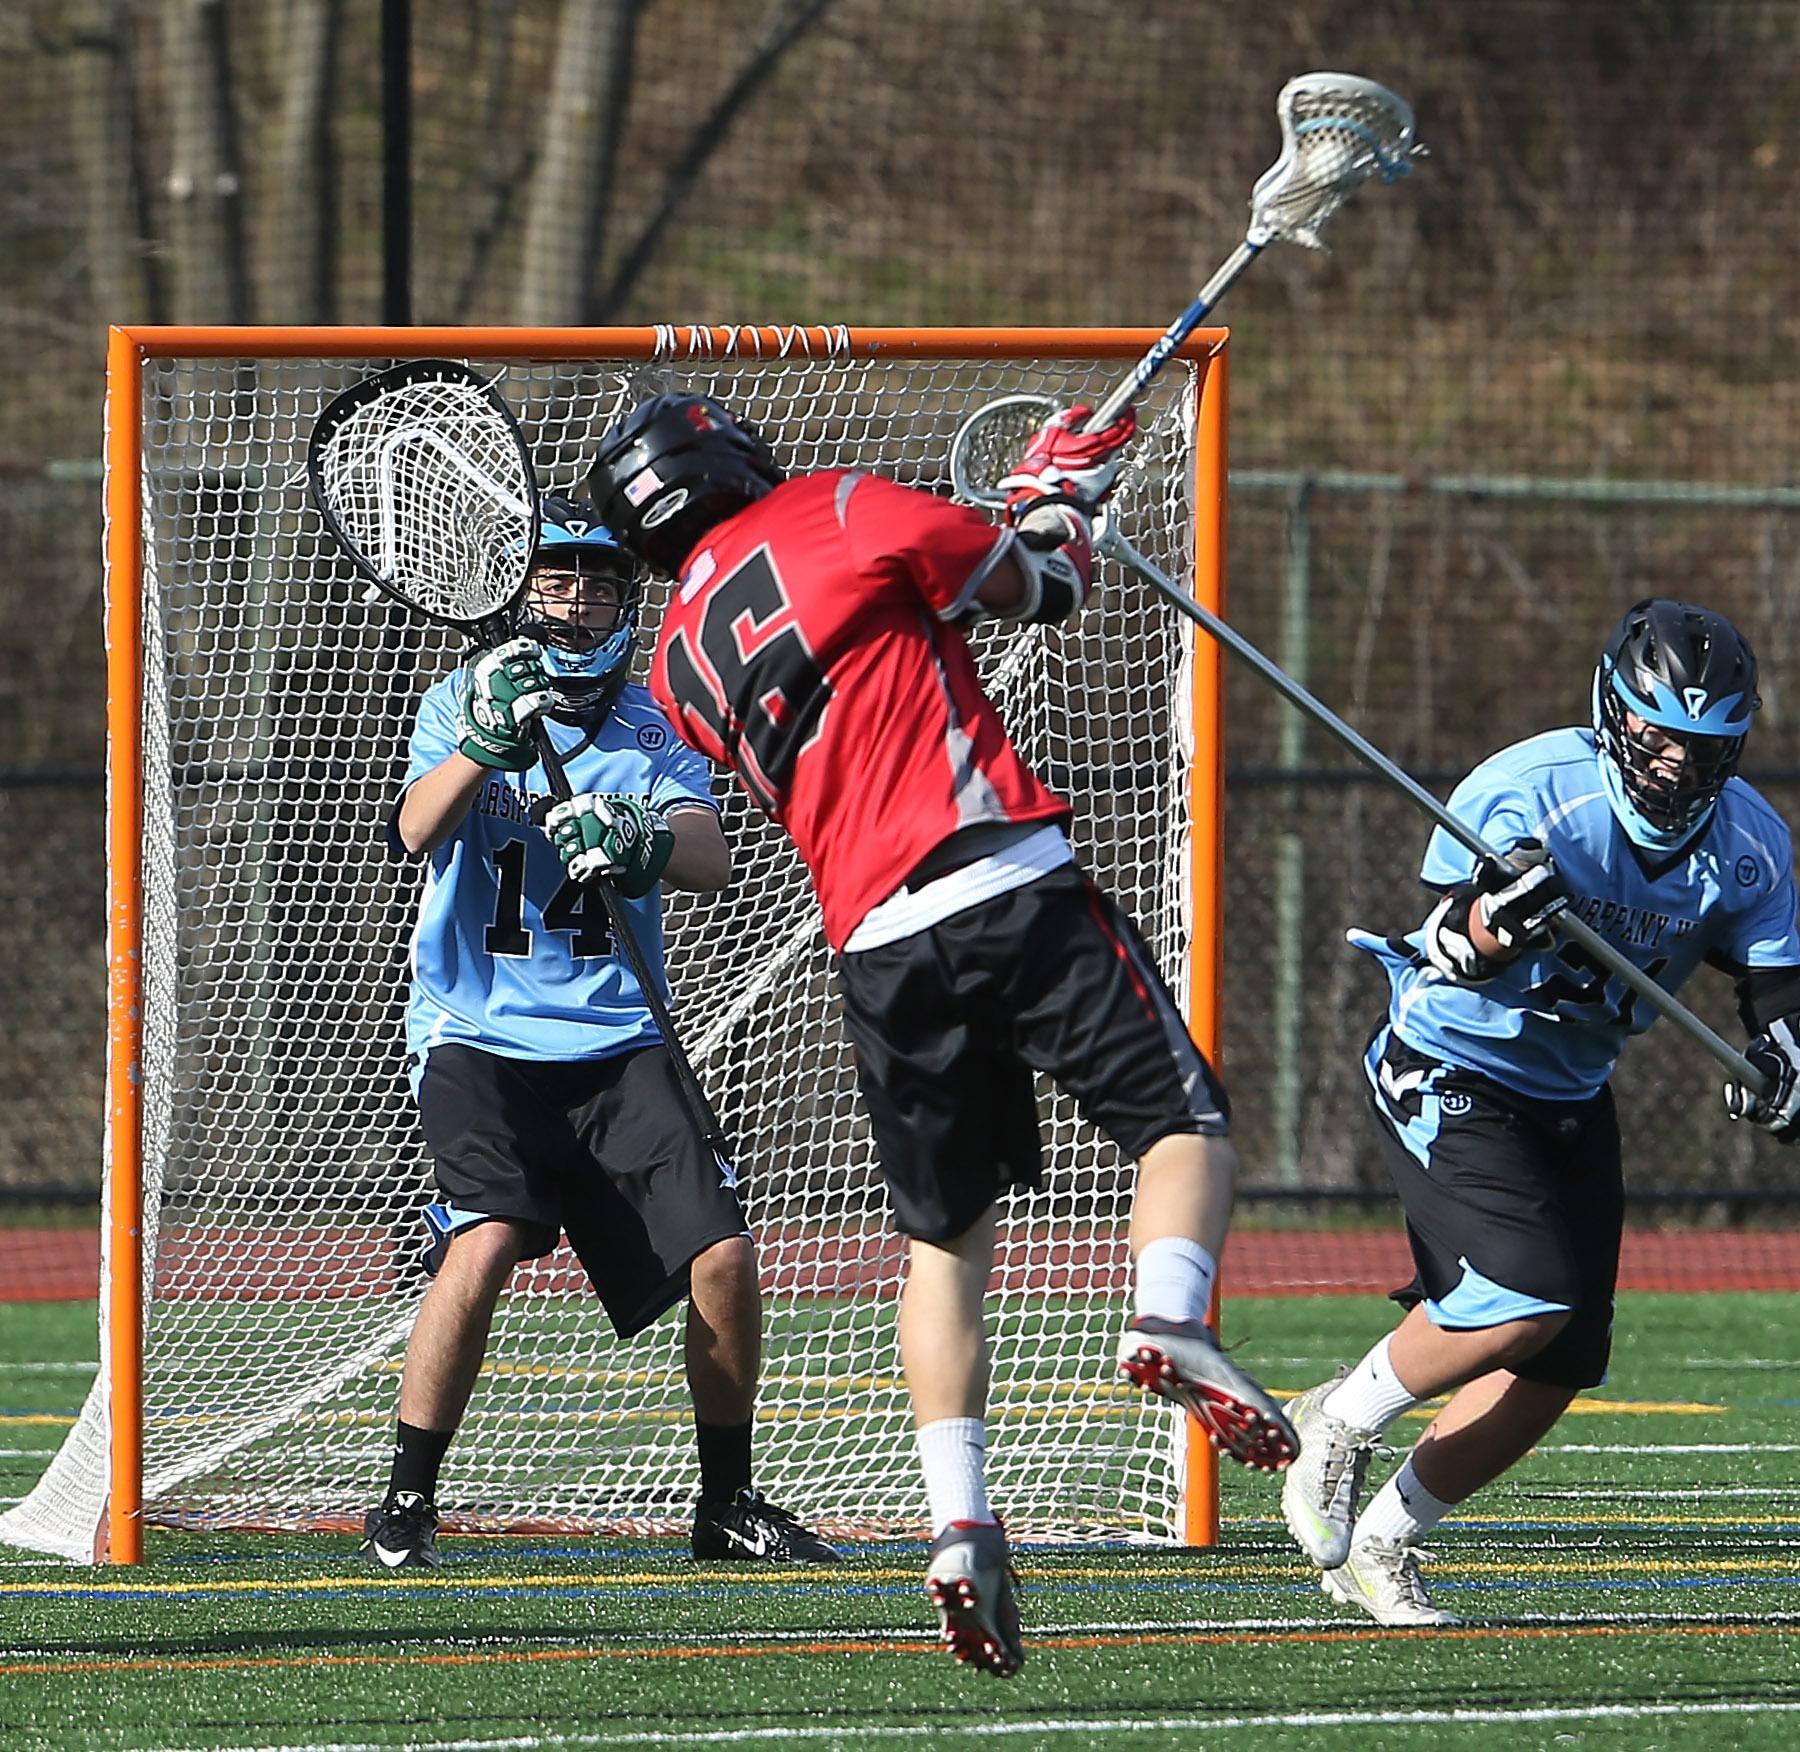 Hookup a lacrosse player meme funny work